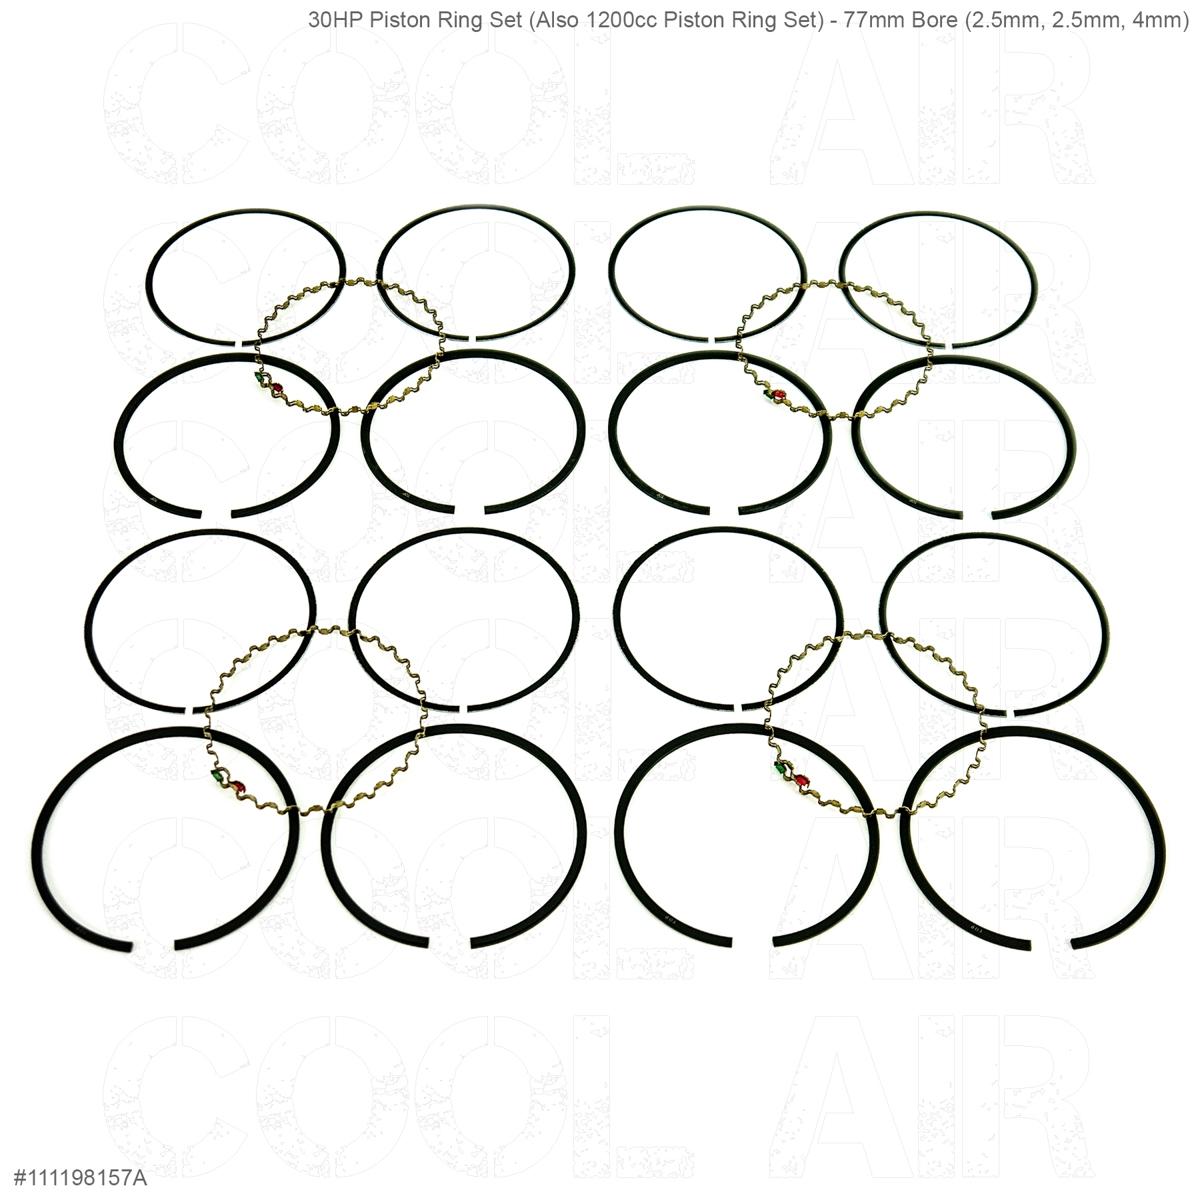 30HP Piston Ring Set (Also 1200cc Piston Ring Set) - 77mm Bore (2.5mm, 2.5mm, 4mm)